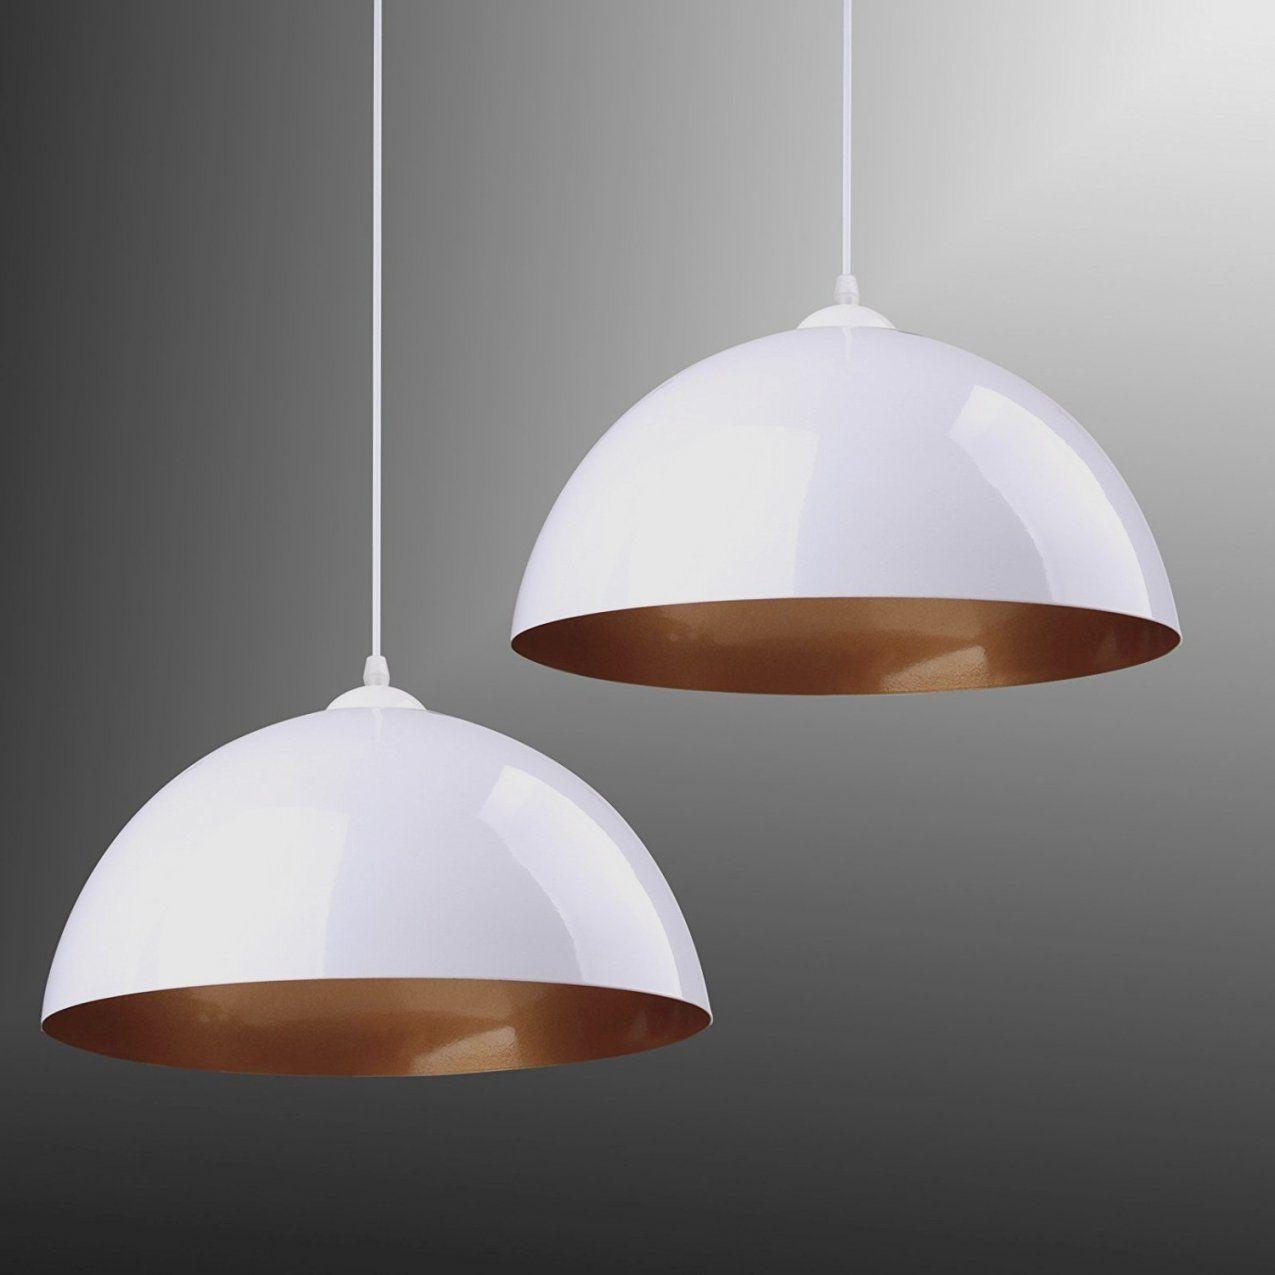 ikea lampe schwarz kupfer haus design ideen. Black Bedroom Furniture Sets. Home Design Ideas